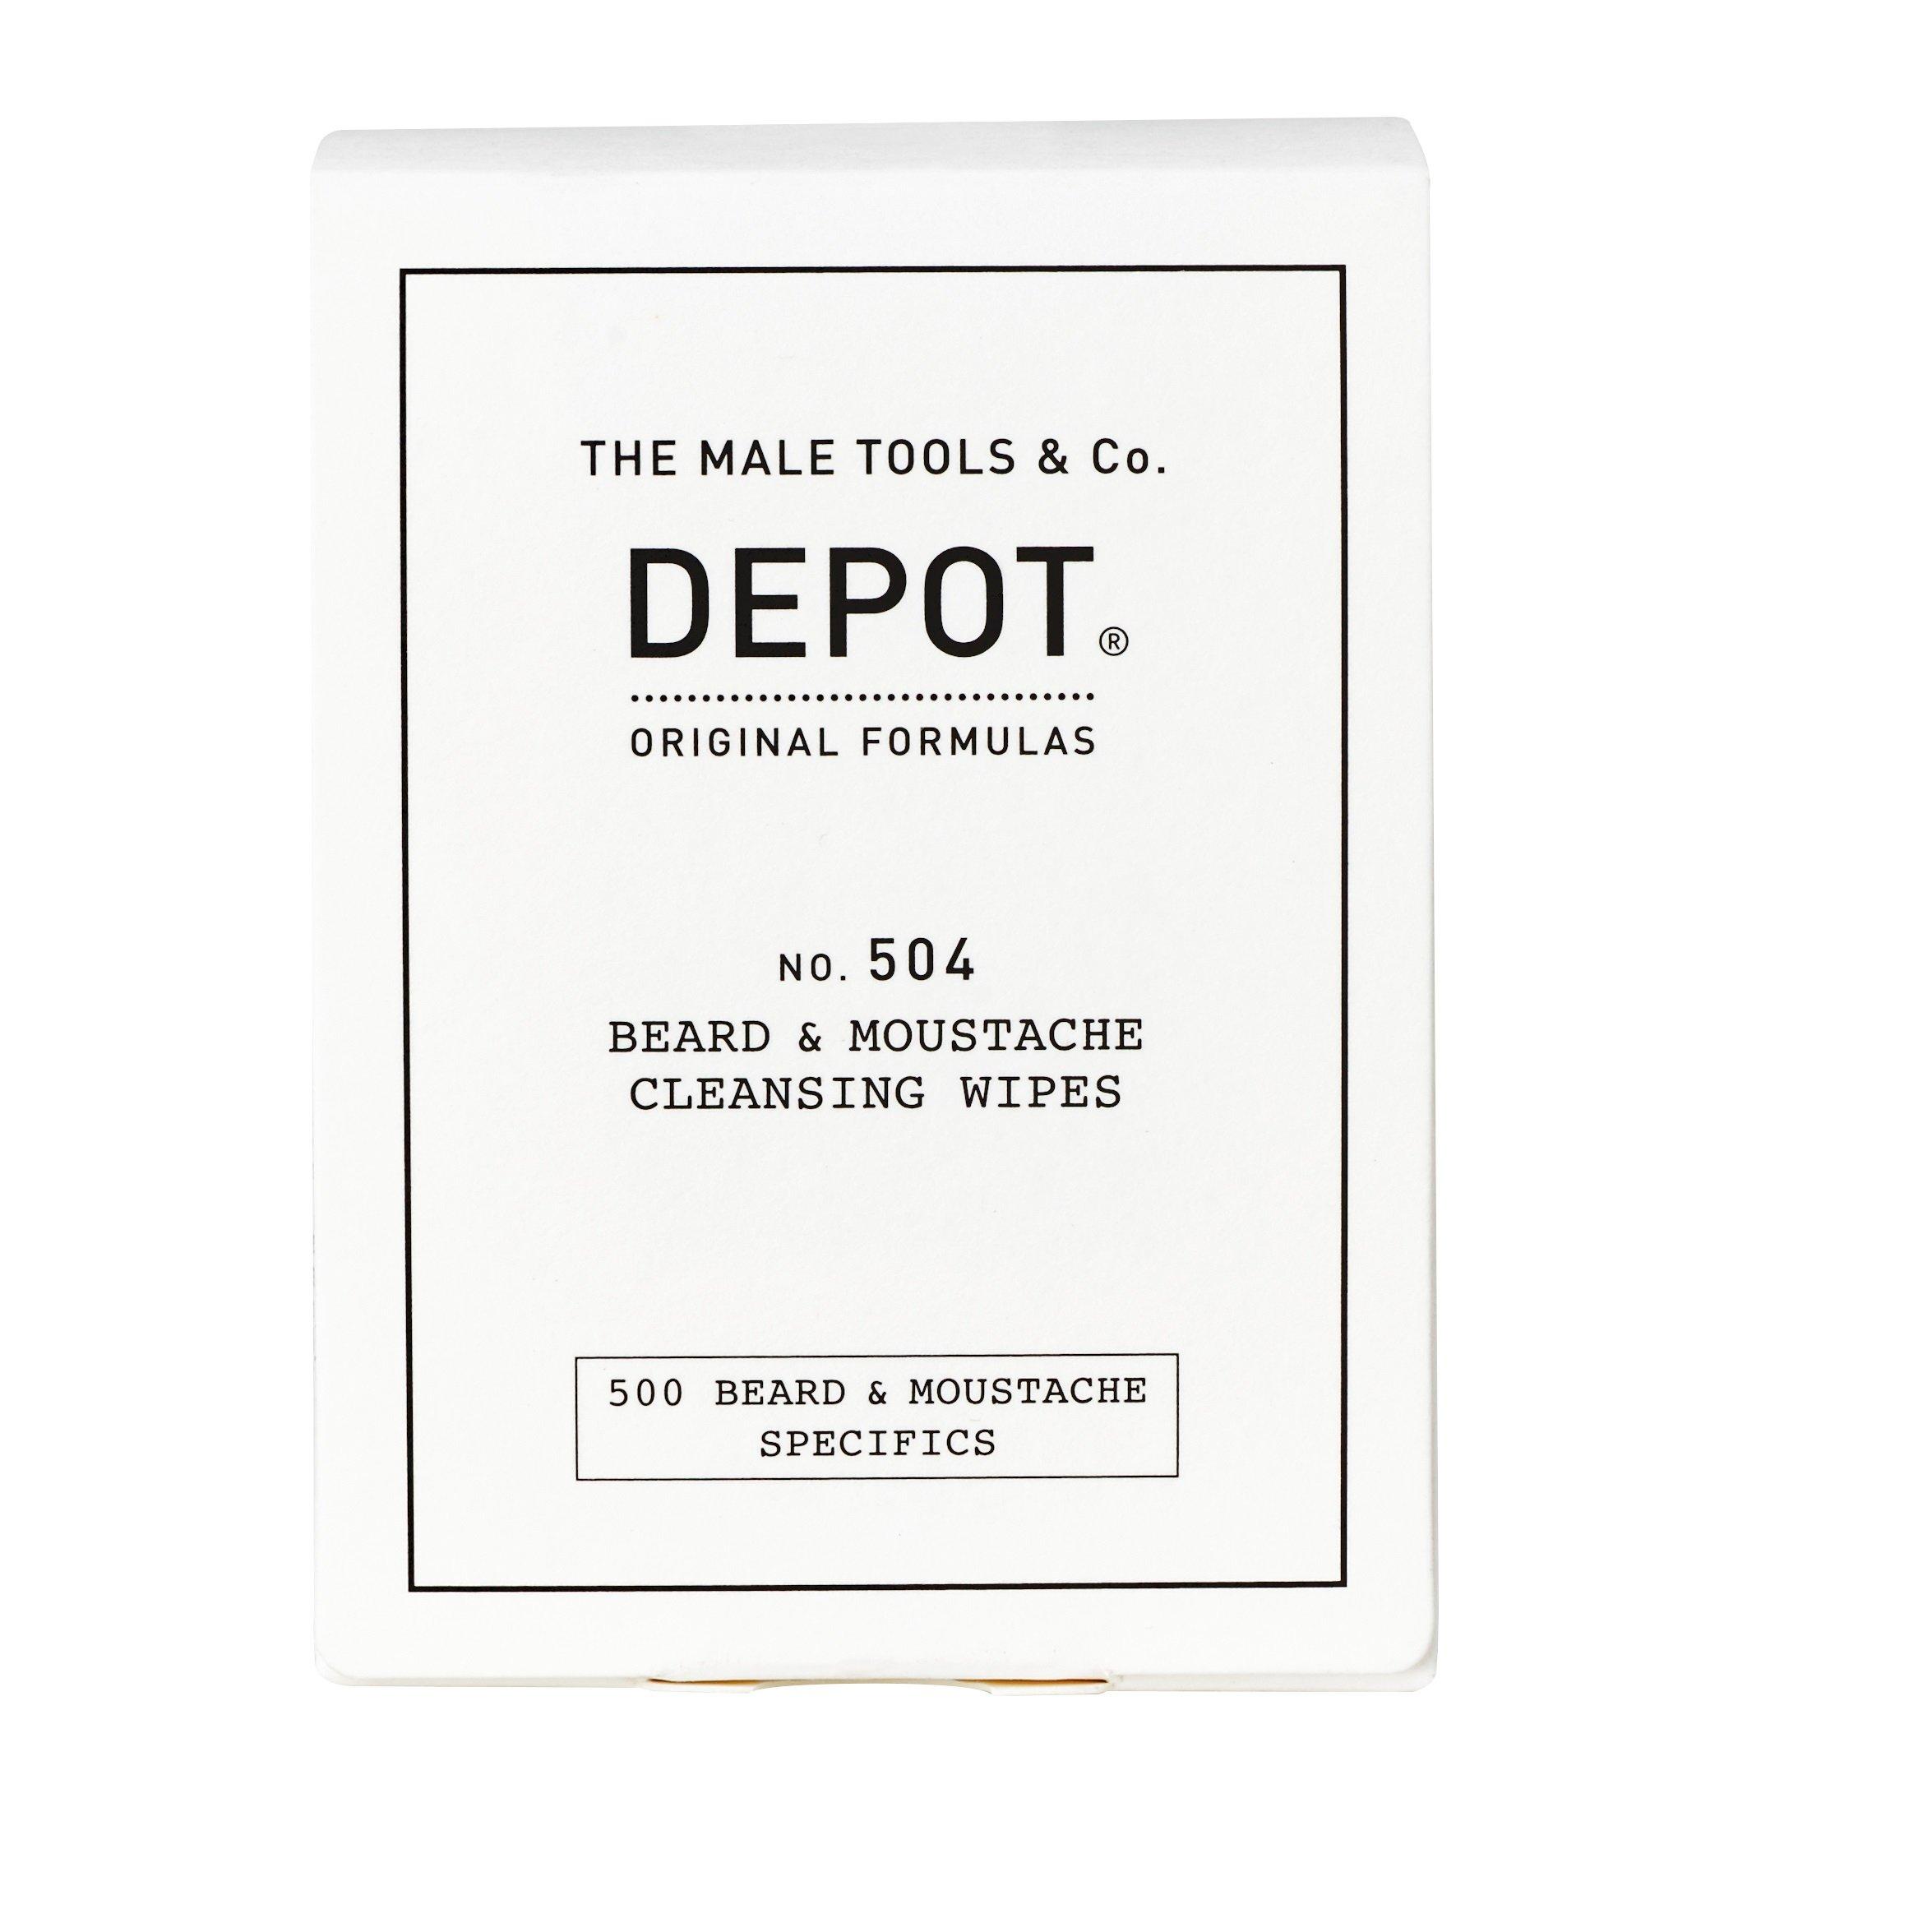 Depot - No. 504 Beard & Moustache Cleansing Wipes 12 Salviette